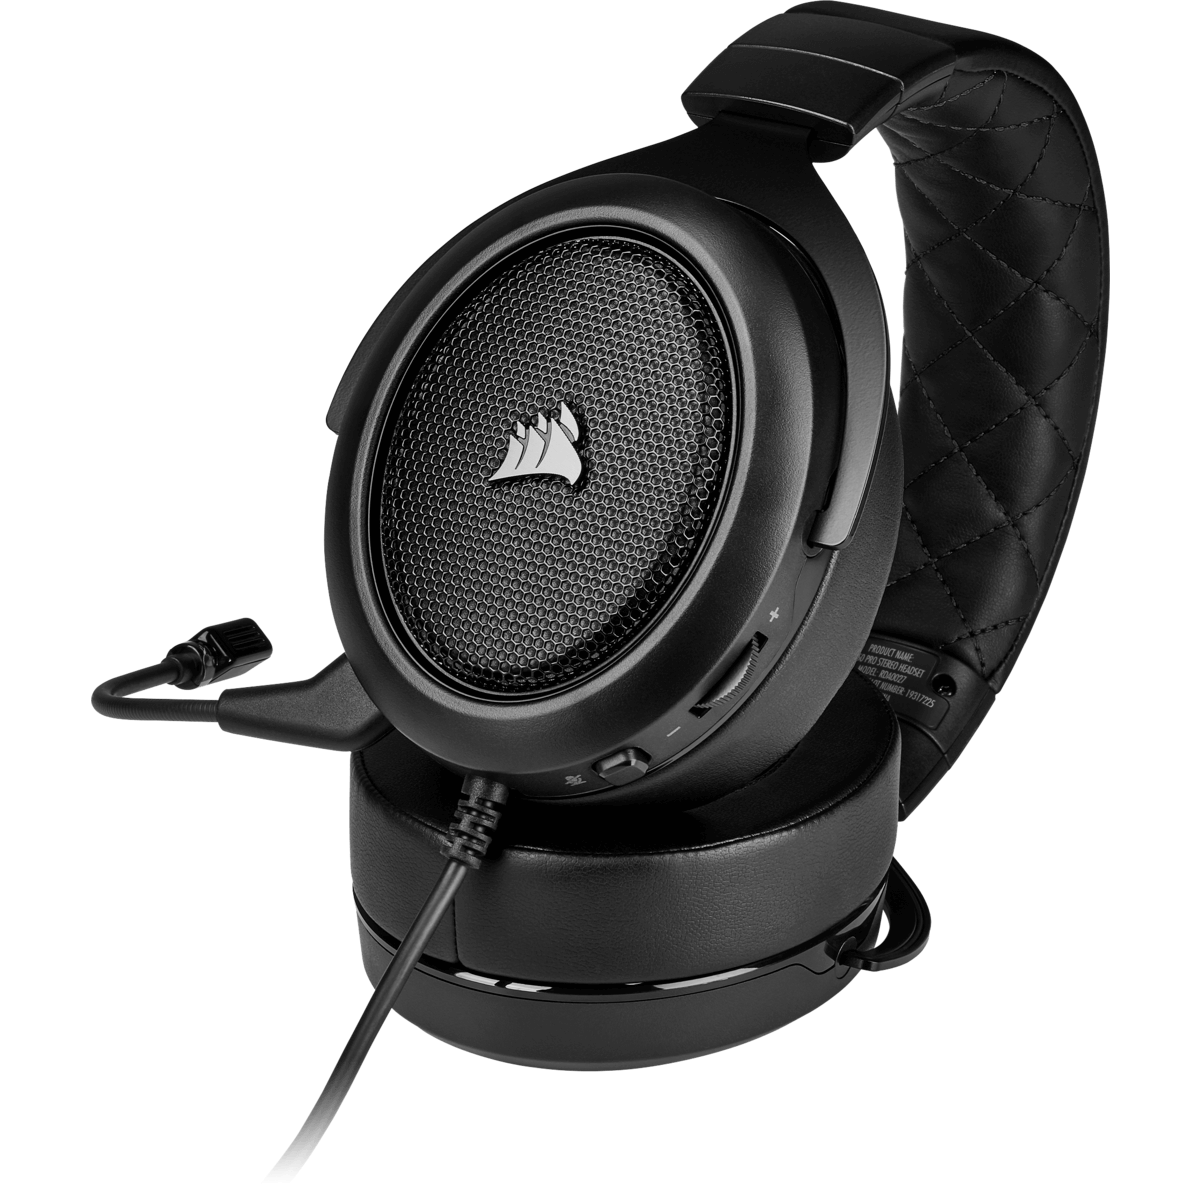 Headset Gamer Corsair HS50 Pro Stereo Carbon, CA-9011215-EU